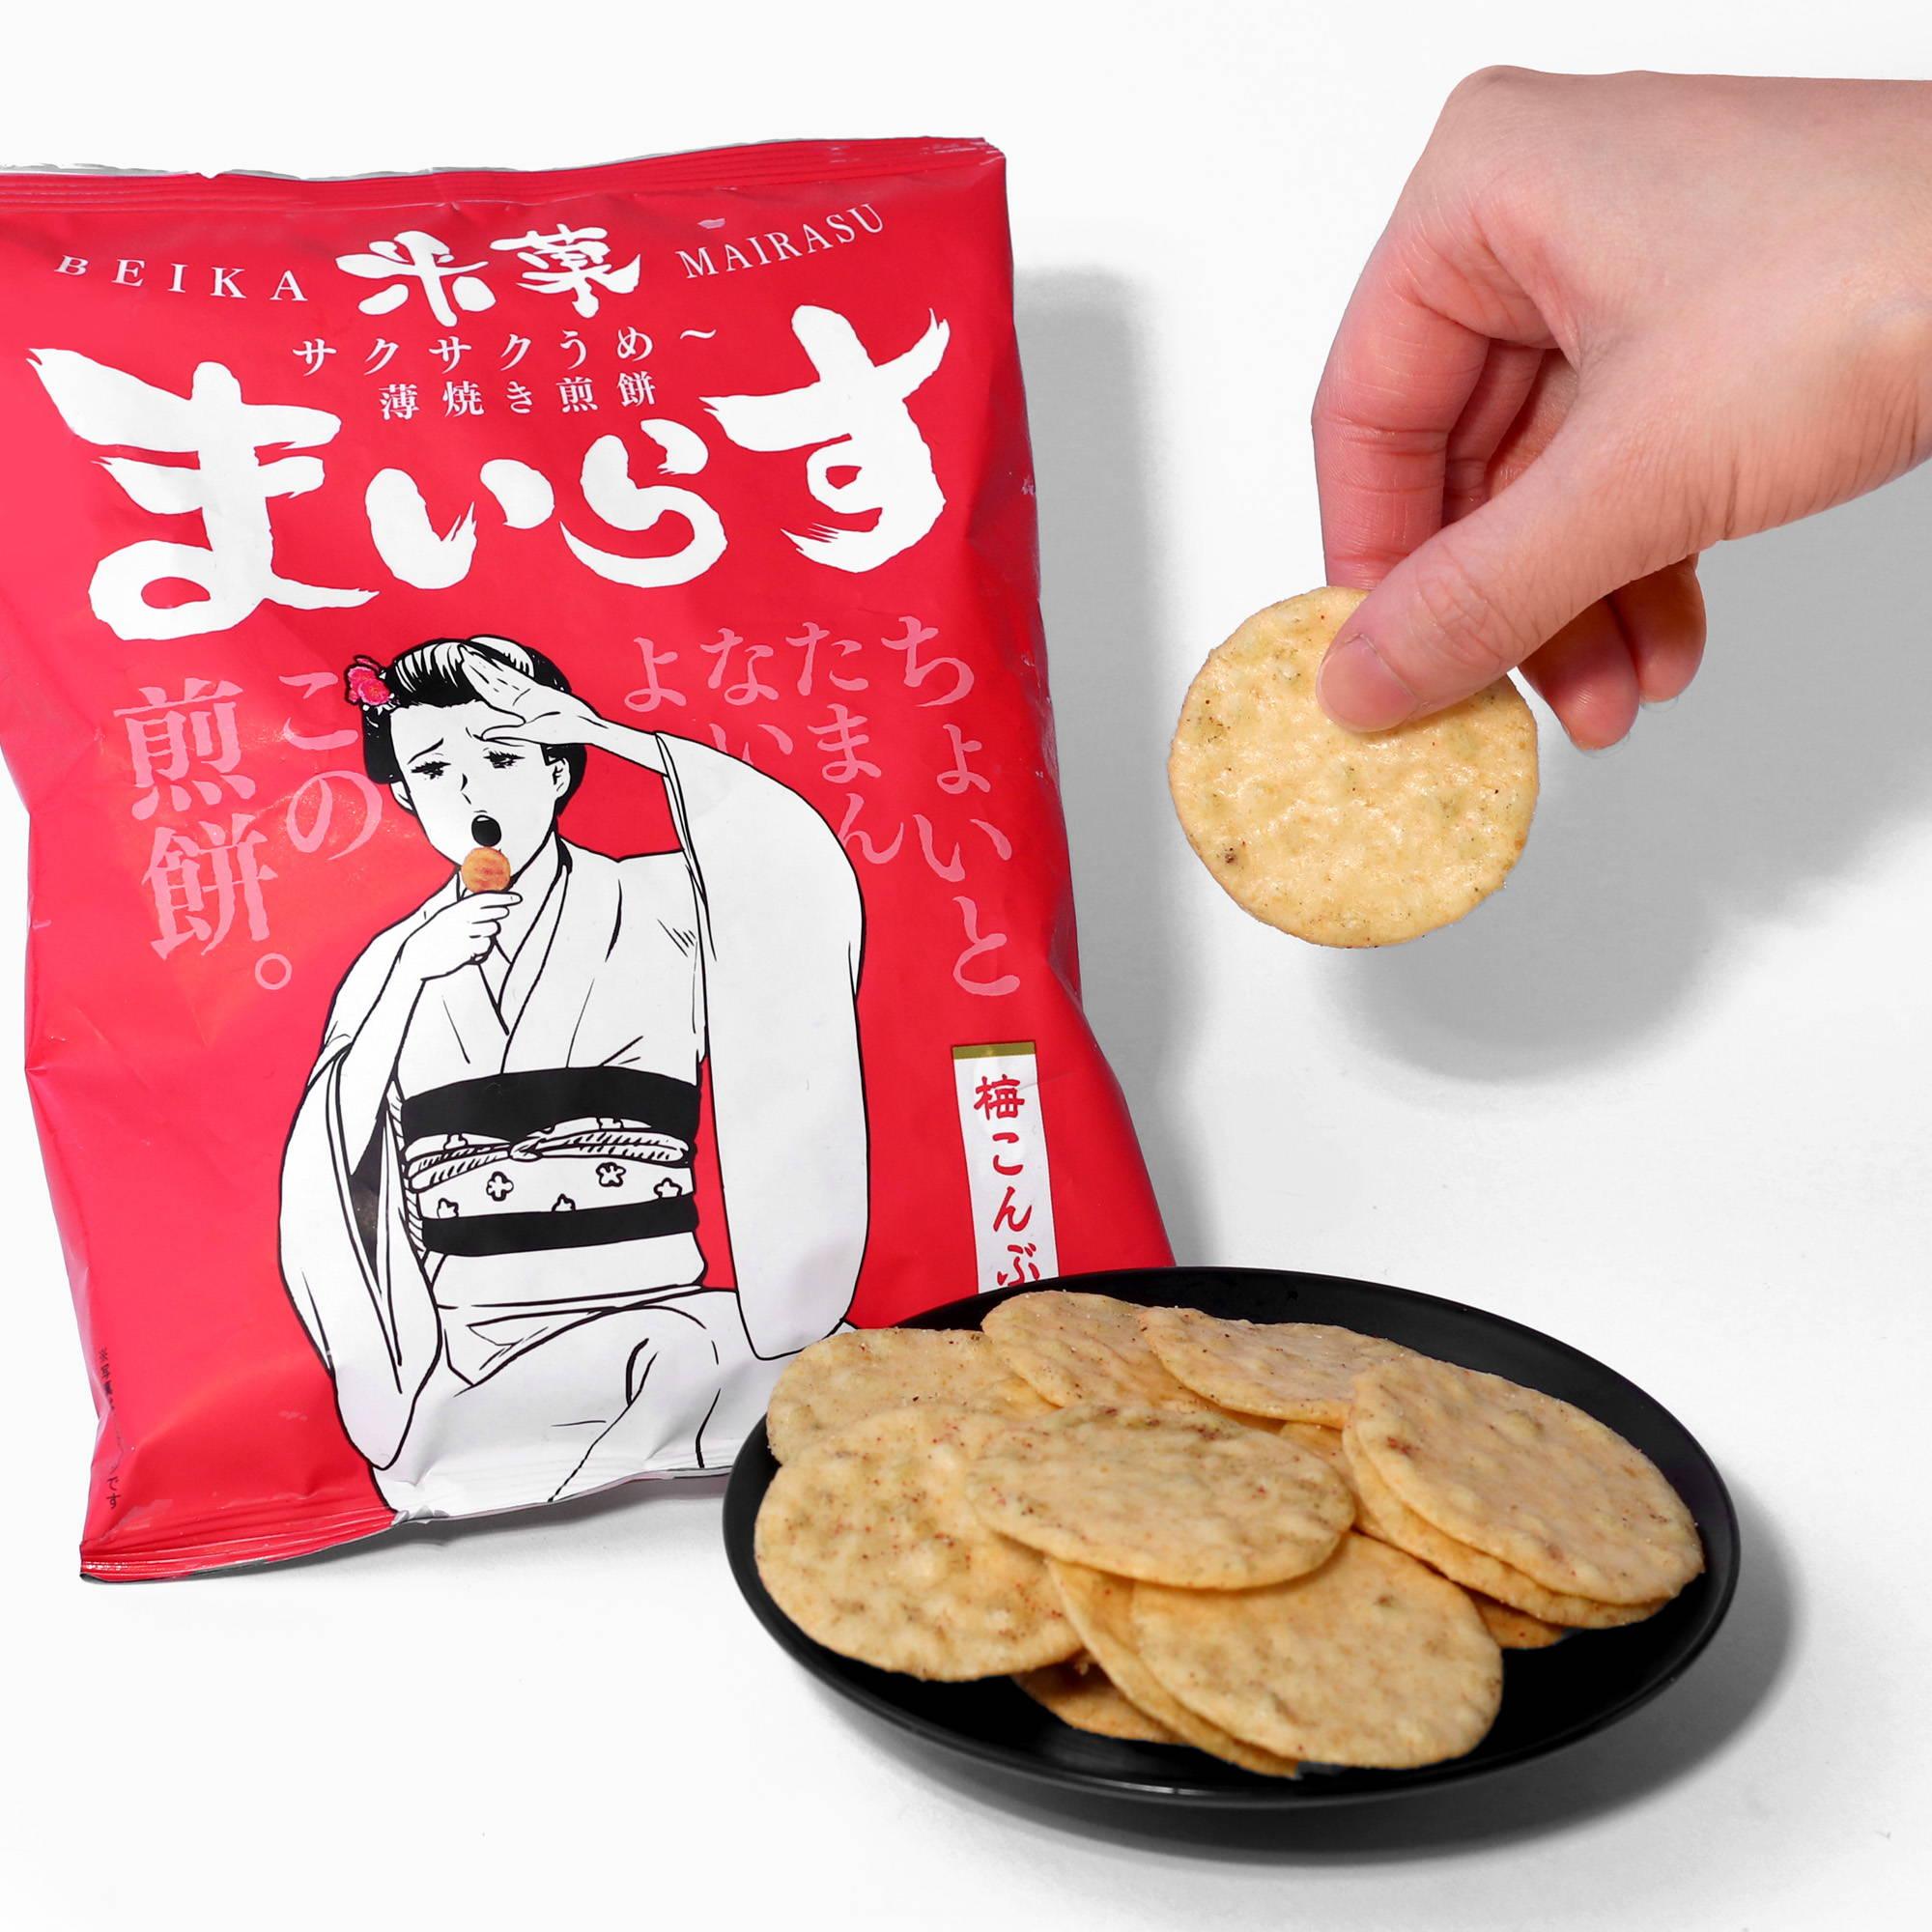 Beika Mairasu Rice Cracker: Plum + Kombu Flavor